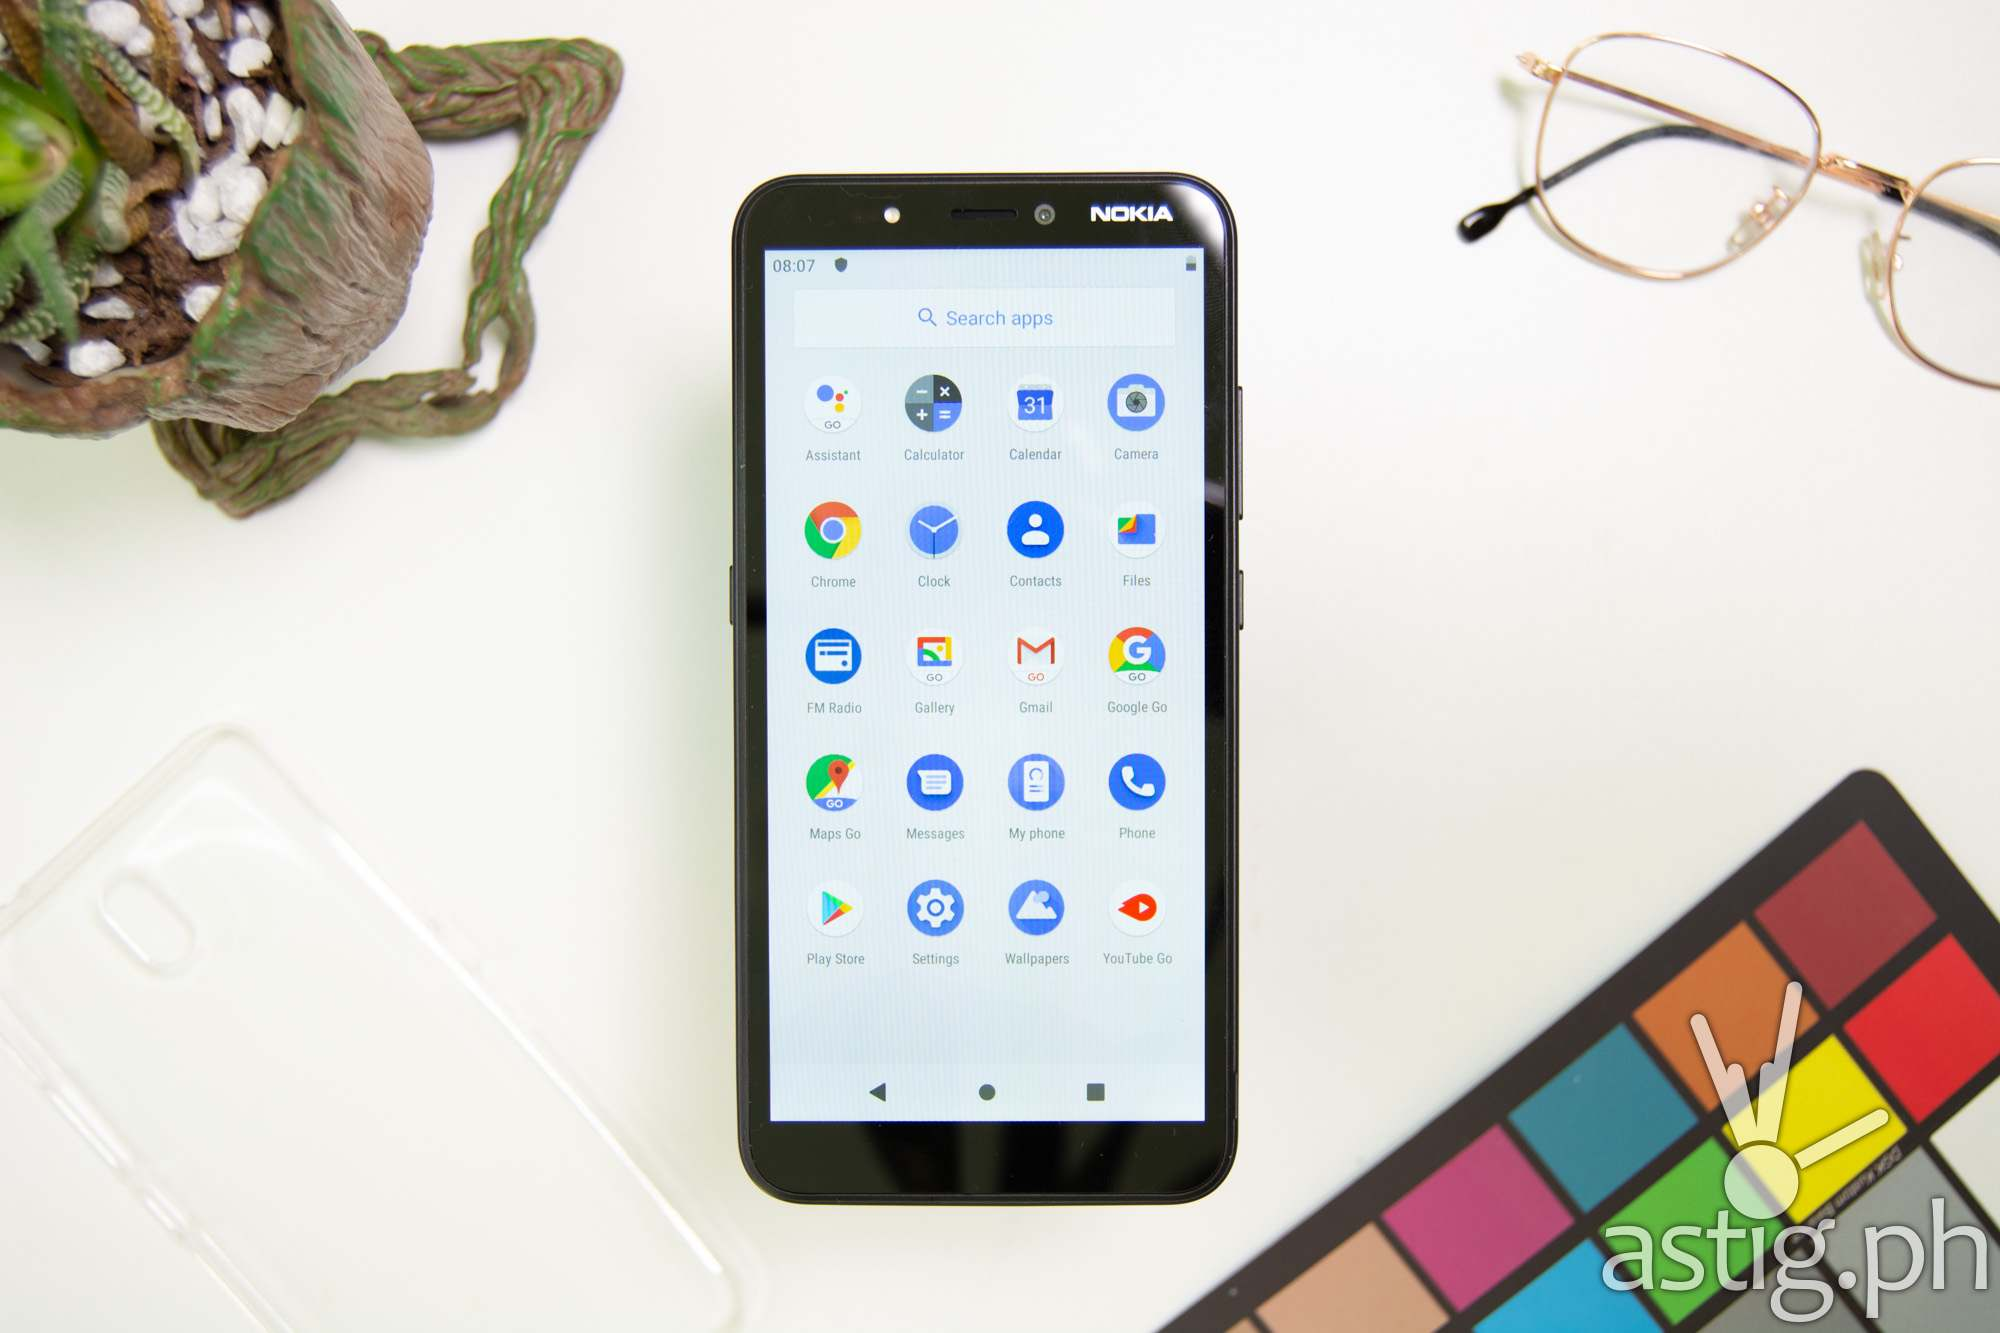 Applications - Nokia C2 (Philippines)